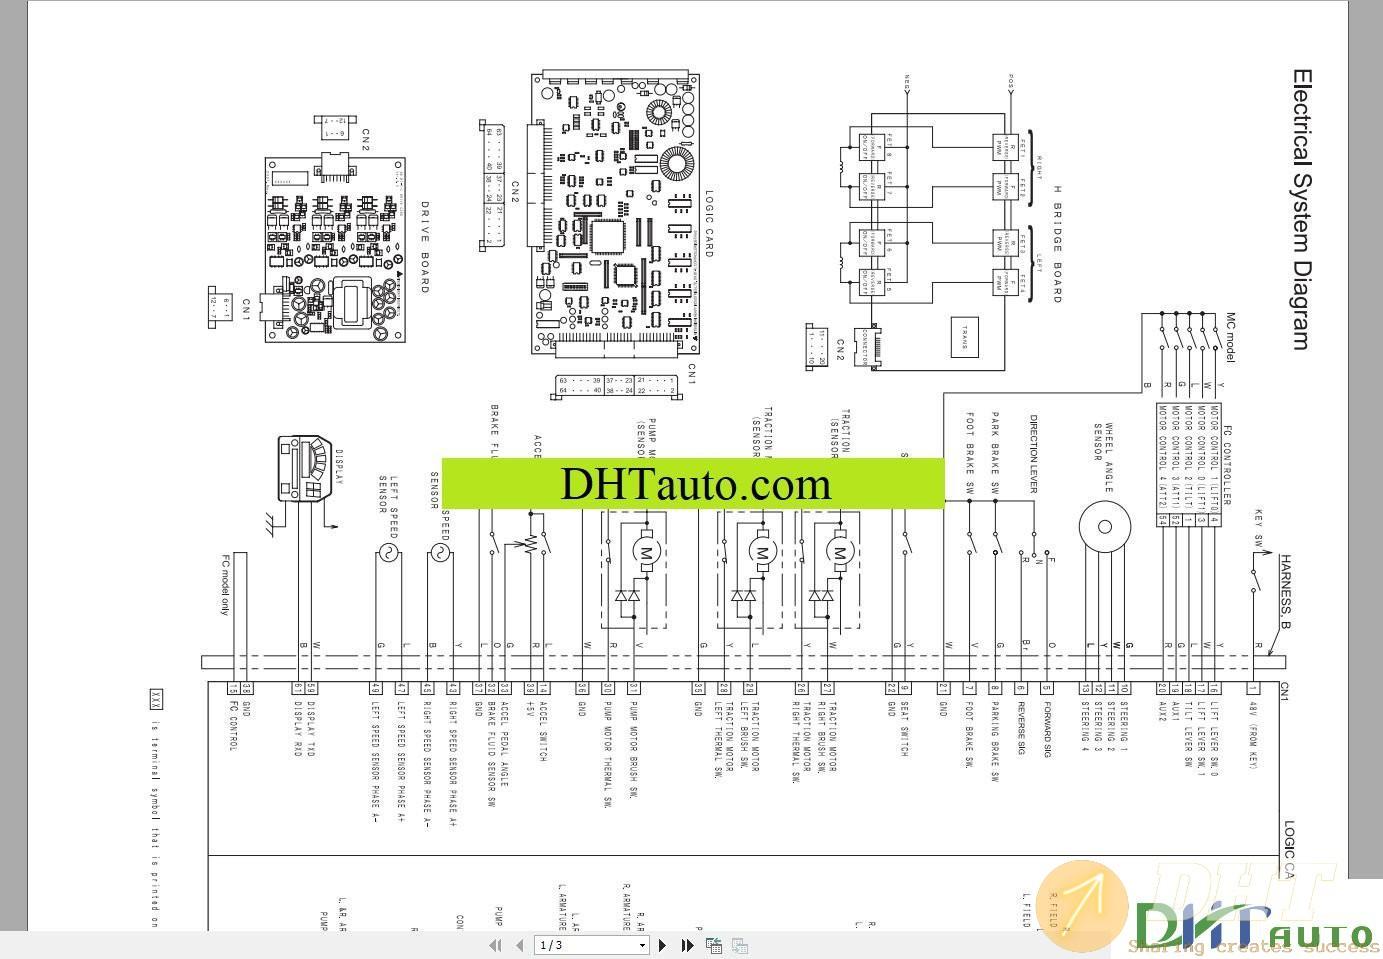 Mitsubishi-Forklift-Truck-Full-Set-Manual-3.jpg